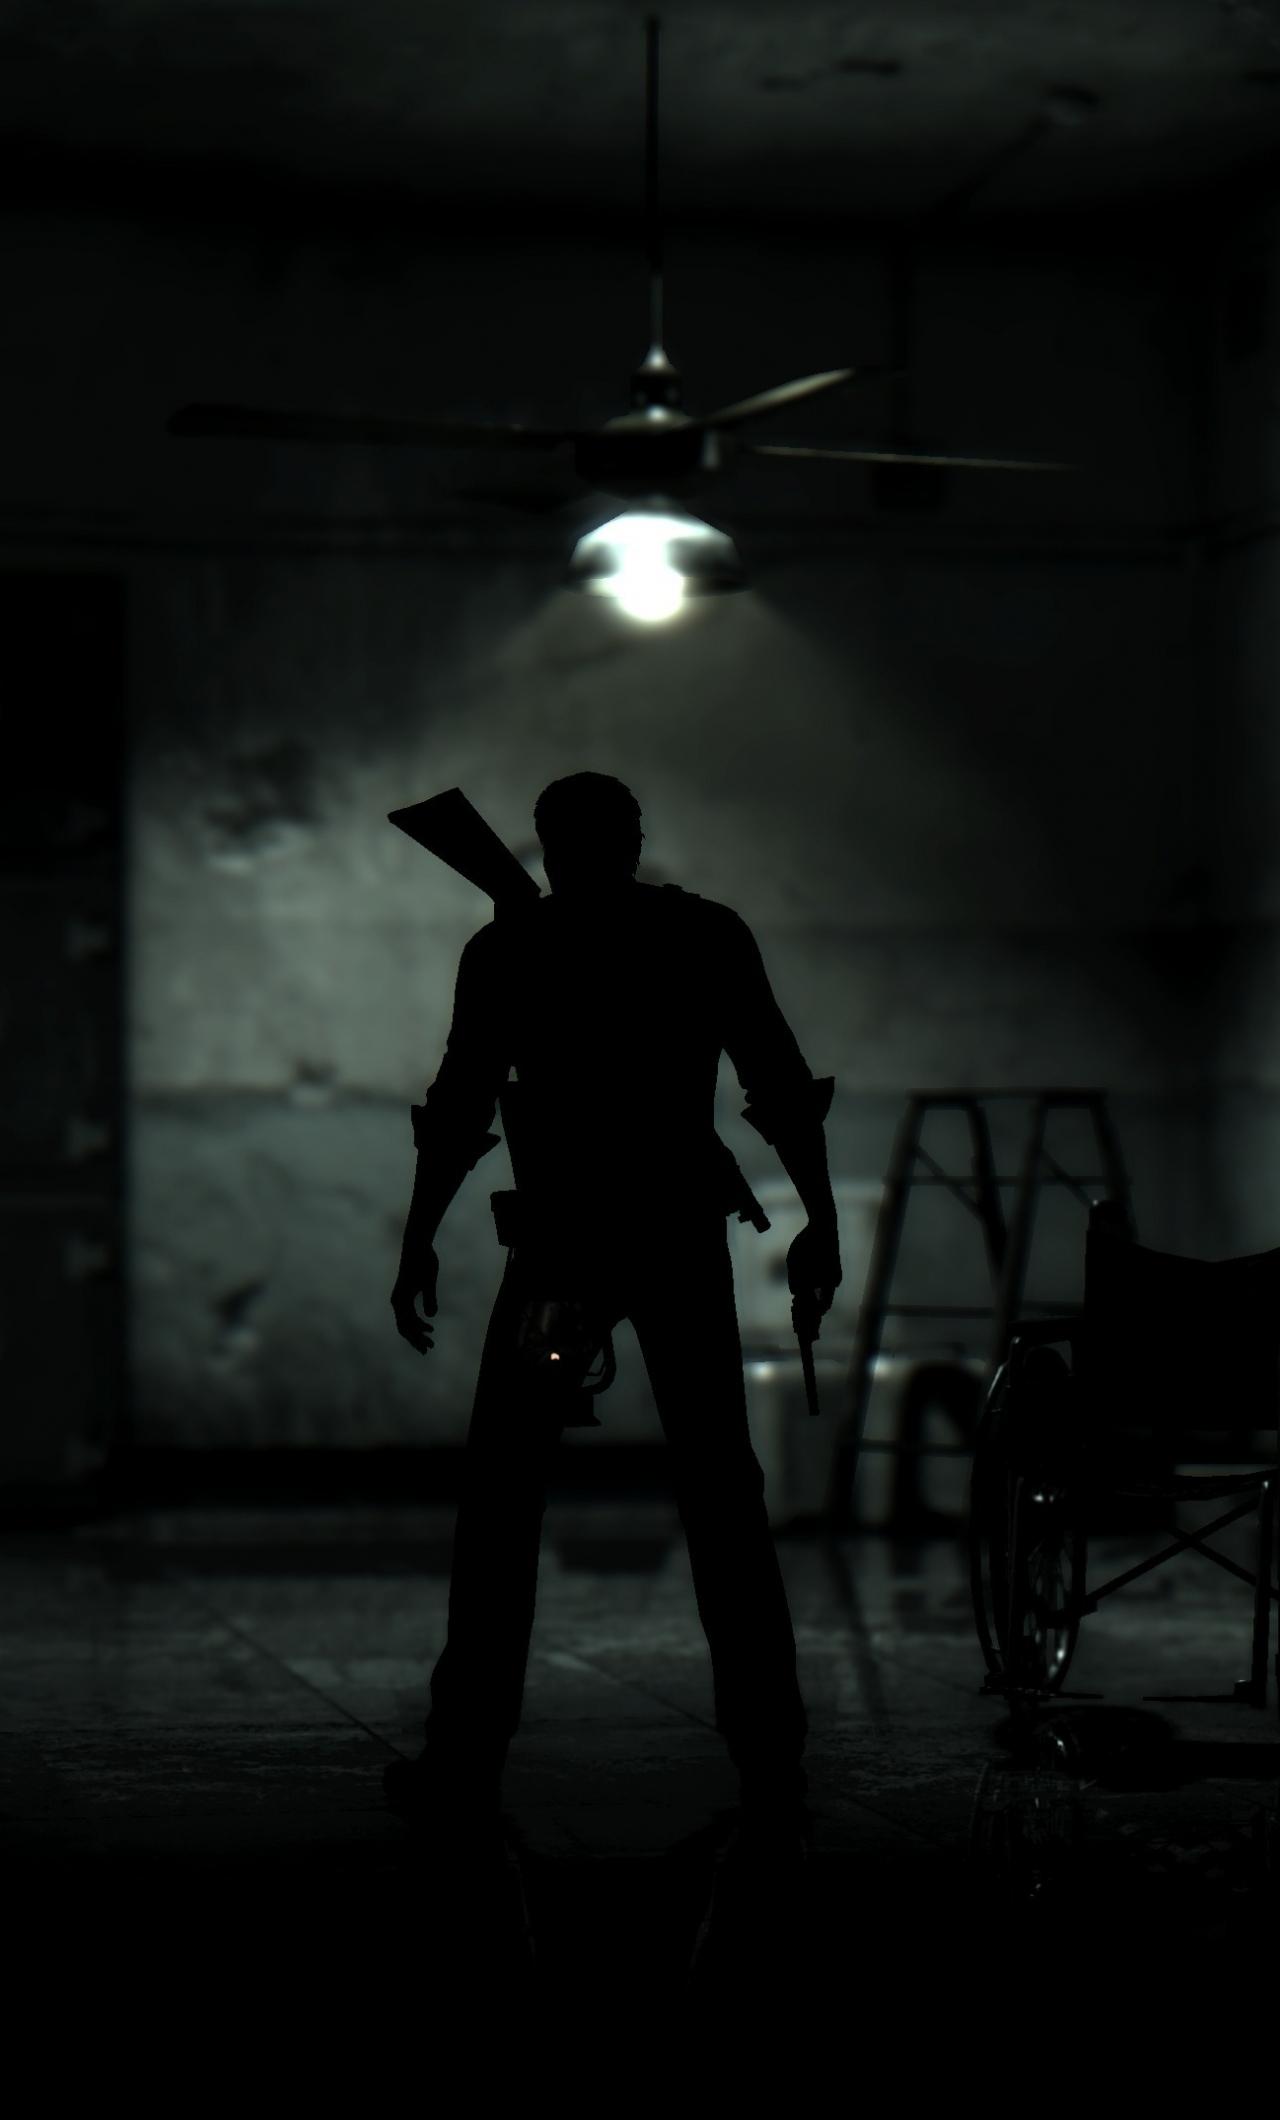 Download 1280x2120 Wallpaper Dark The Evil Within 2 Man With Gun